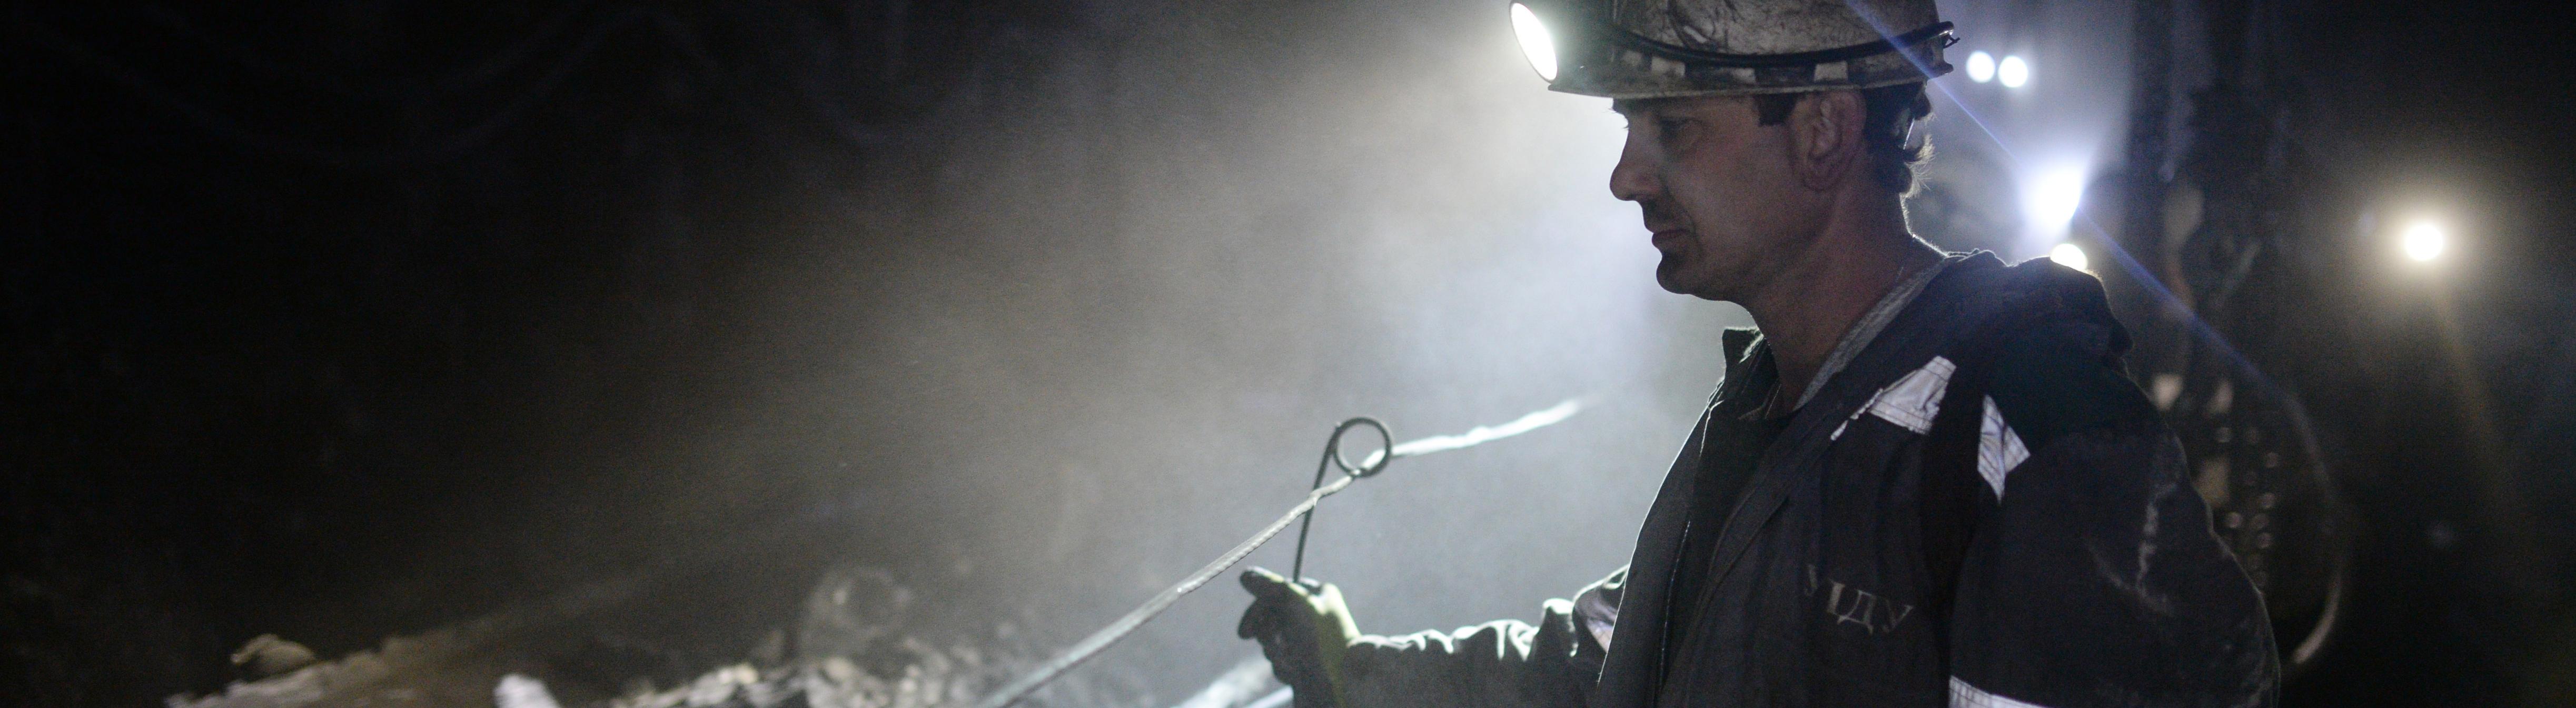 A miner of Sibirginskaya mine developed by Yuzhny Kuzbass company, part of Mechel Mining.mine, coal, extraction, excavator, dump truck Alexandr Kryazhev